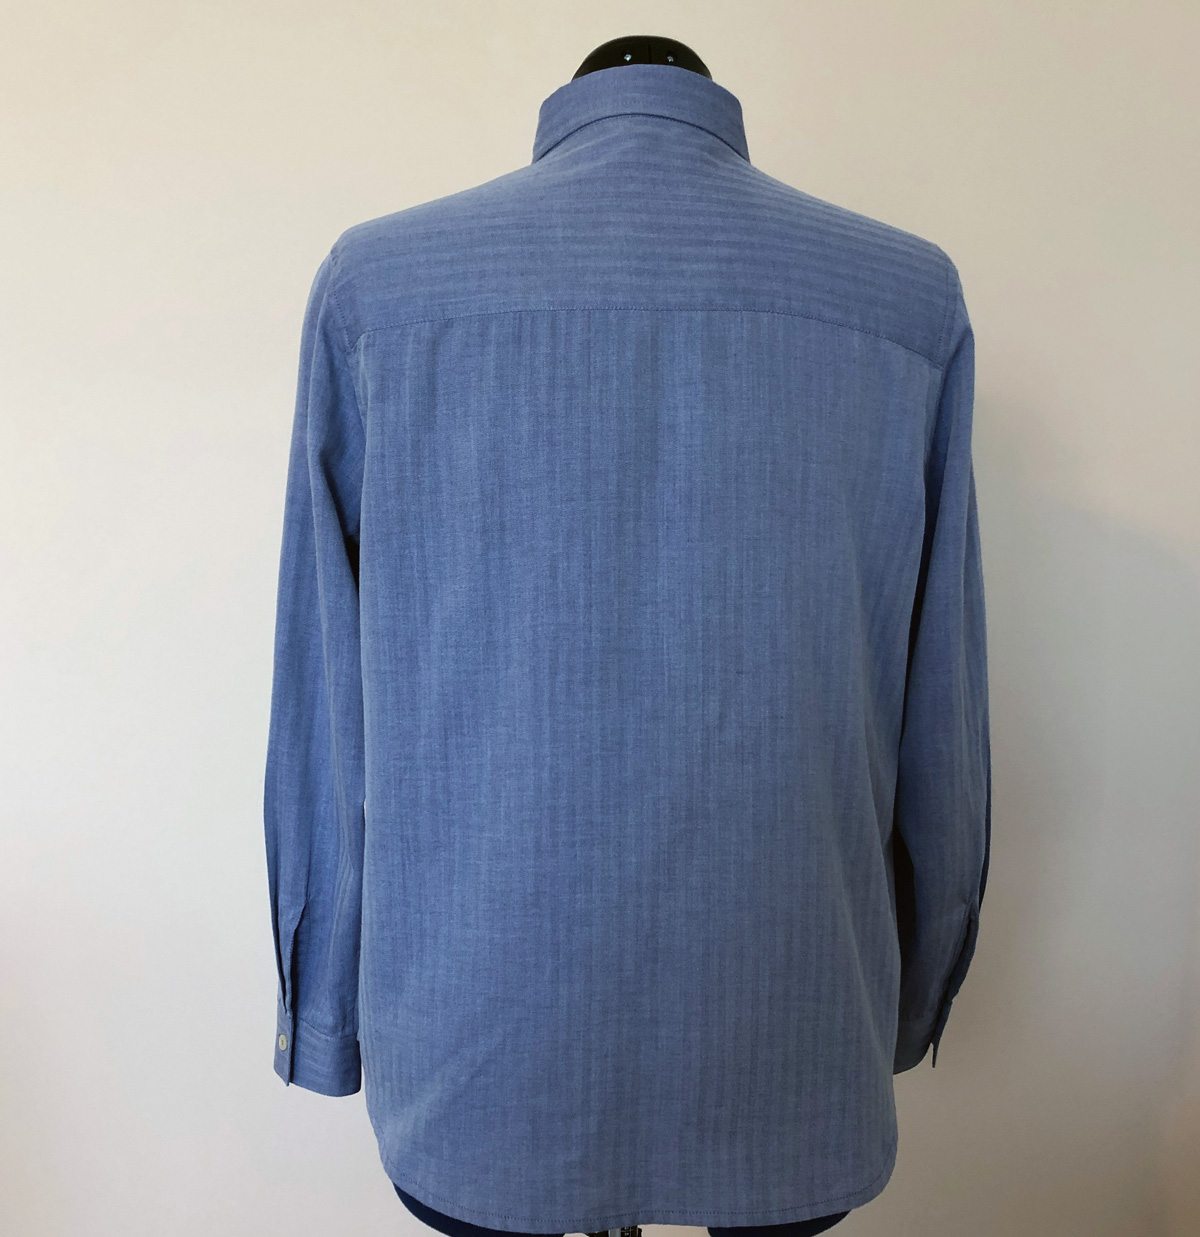 Back of Kwik Sew 3555 shirt on dress form